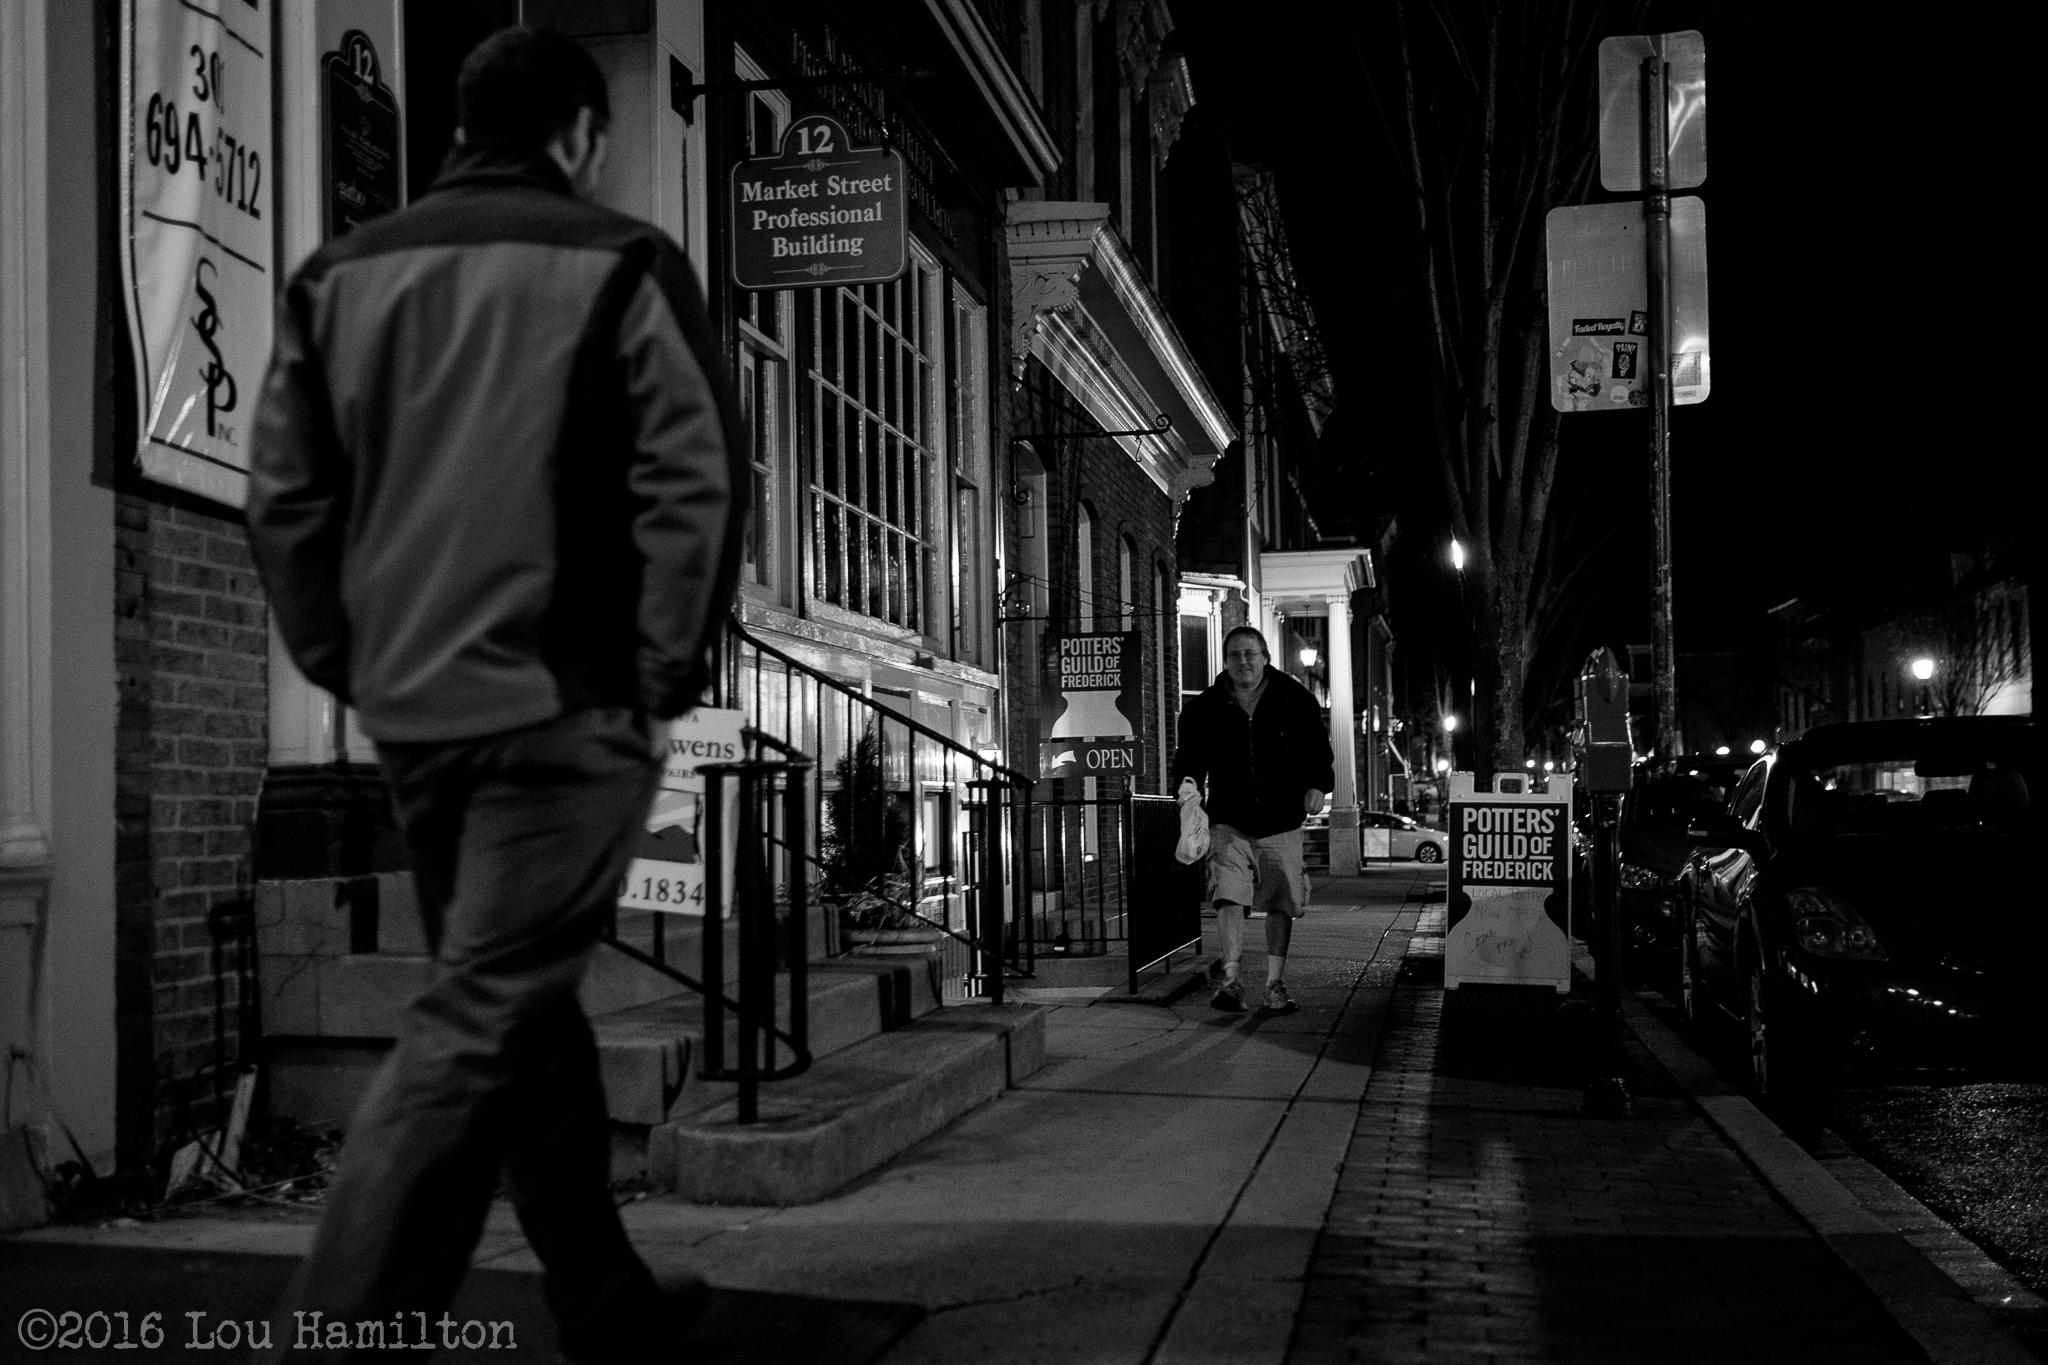 26 February 2016 -- Frederick, MD (Market Street)